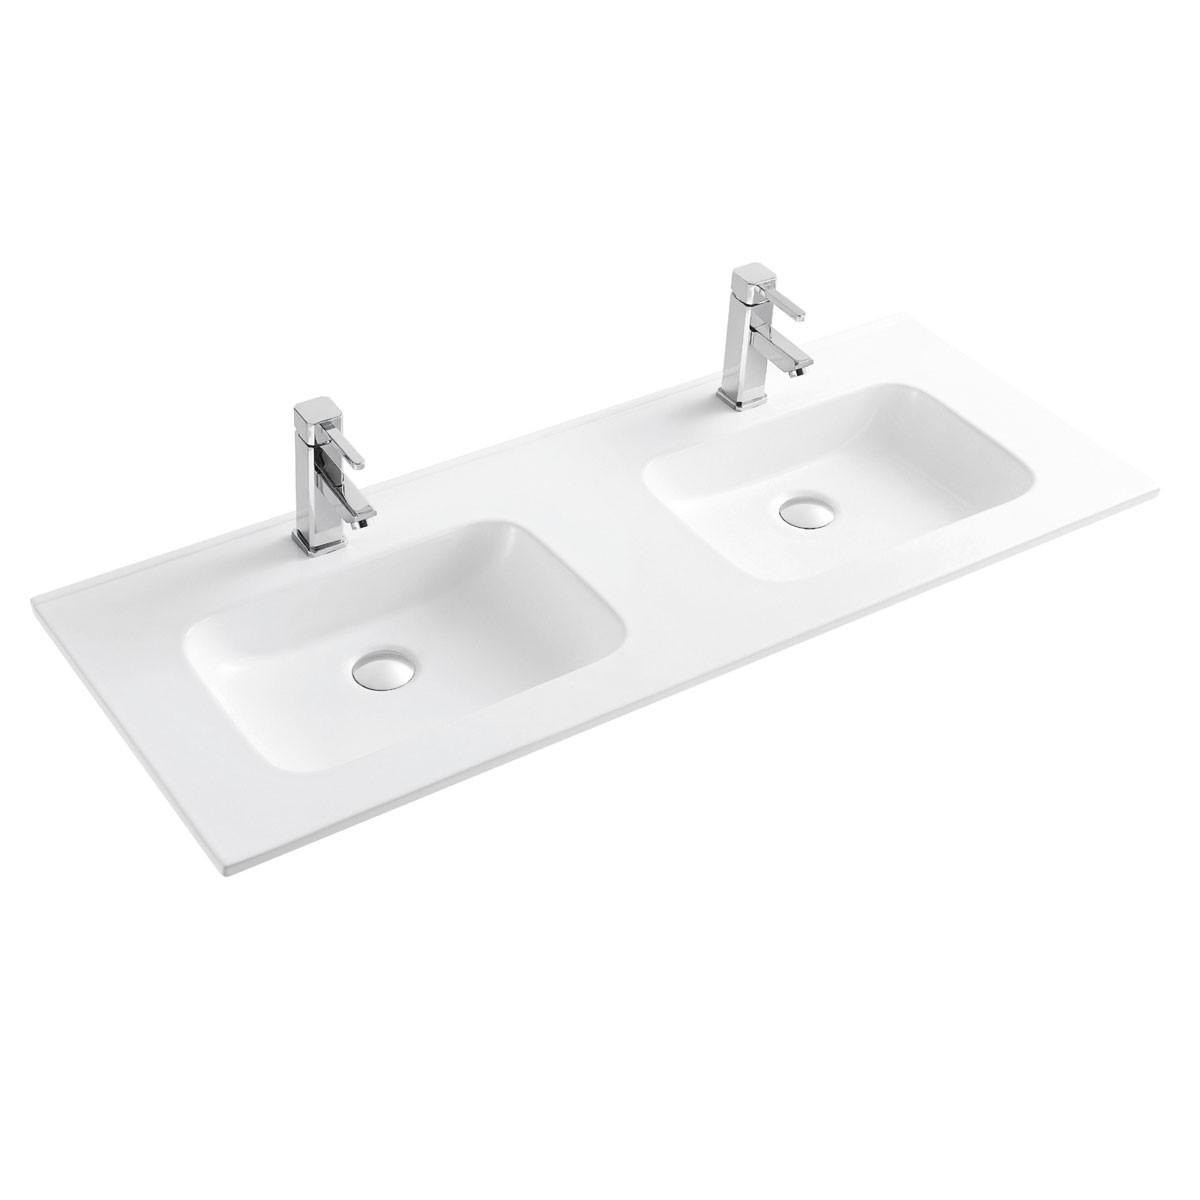 White Rectangle Ceramic Bathroom Vanity Basin (CL-4108D-120)